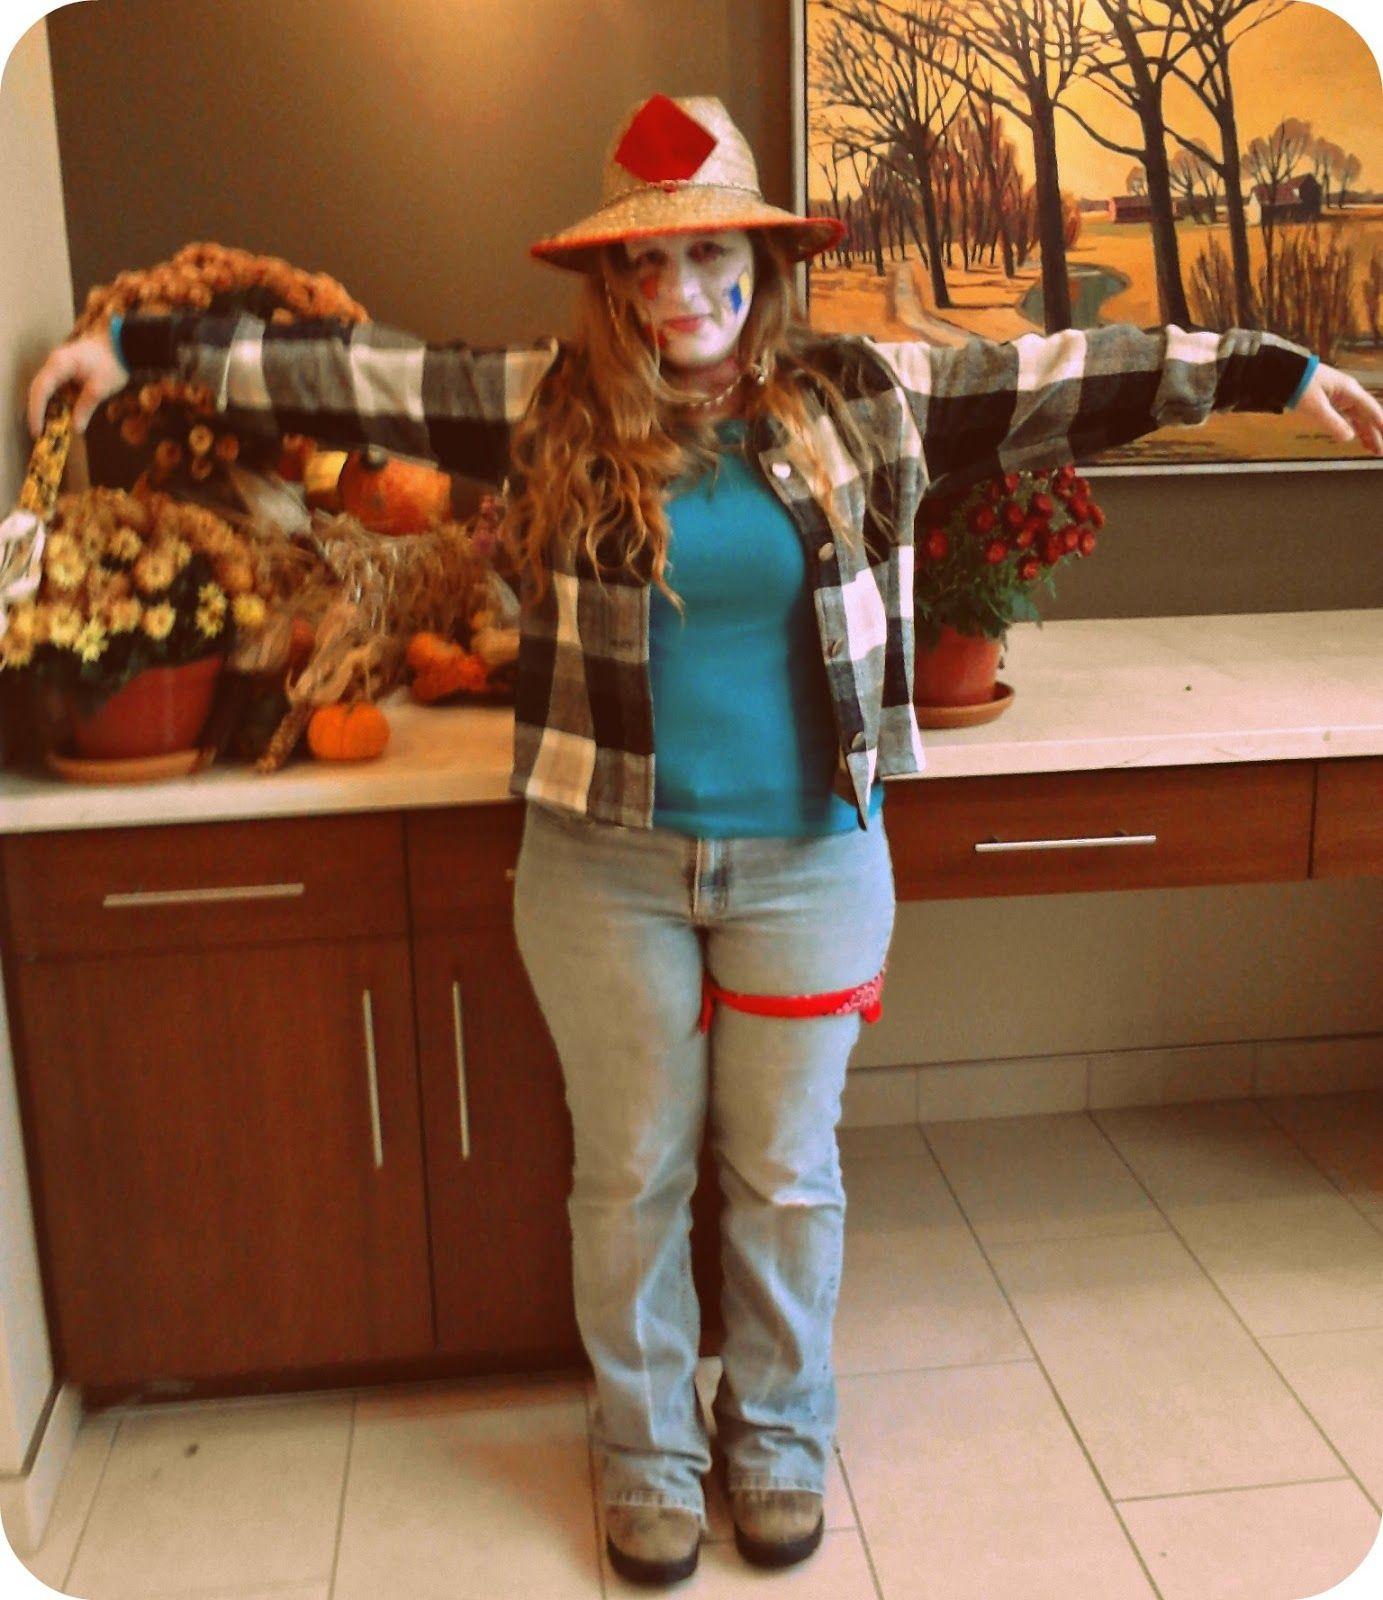 Halloween Ideas Blog: April's Country Life Blog: Happy Halloween! Costume Ideas